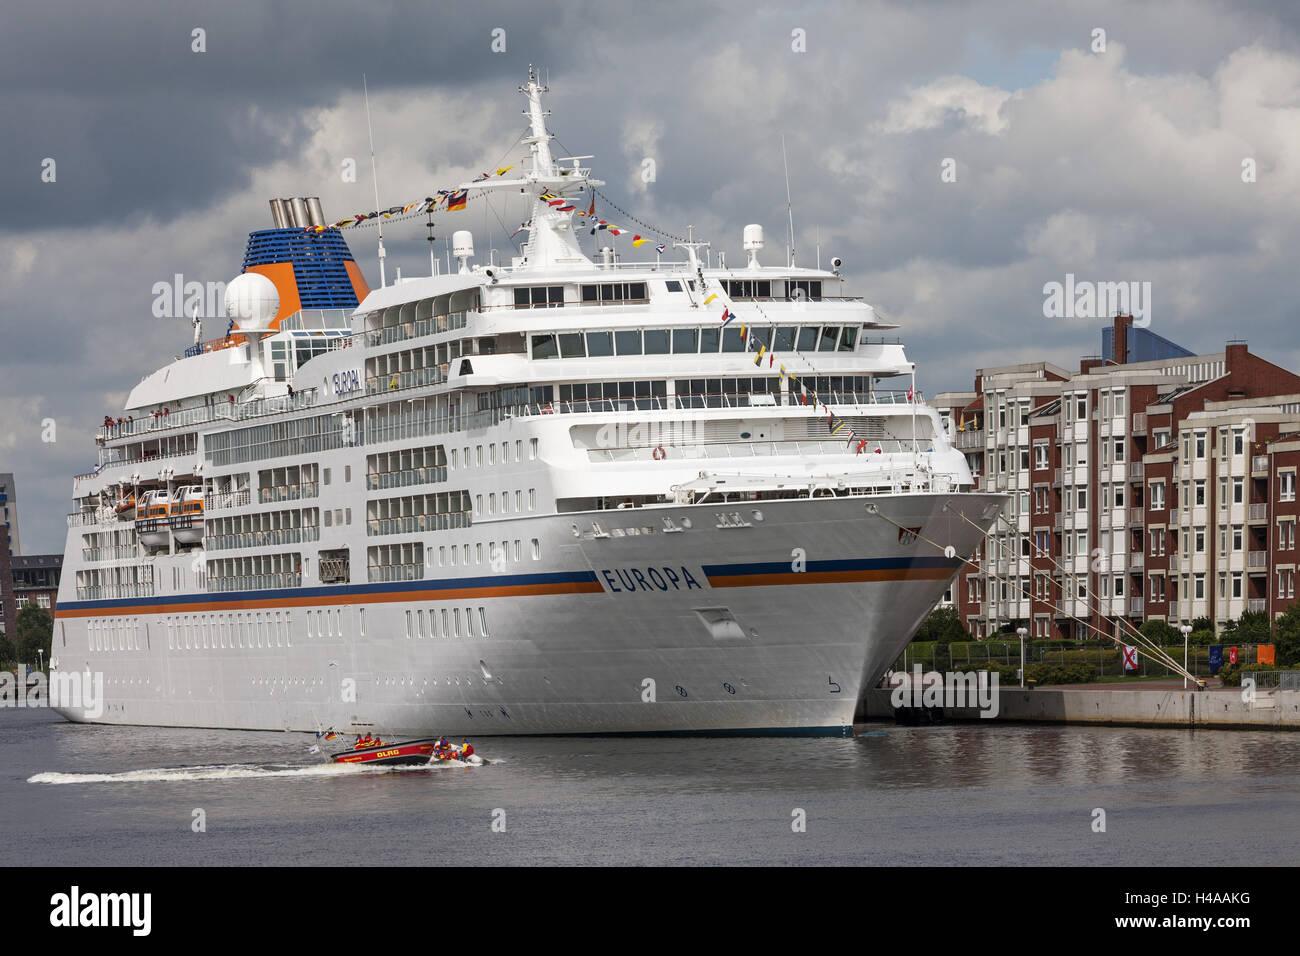 Luxurycruise Ship MS EUROPE In The Quay Bonte